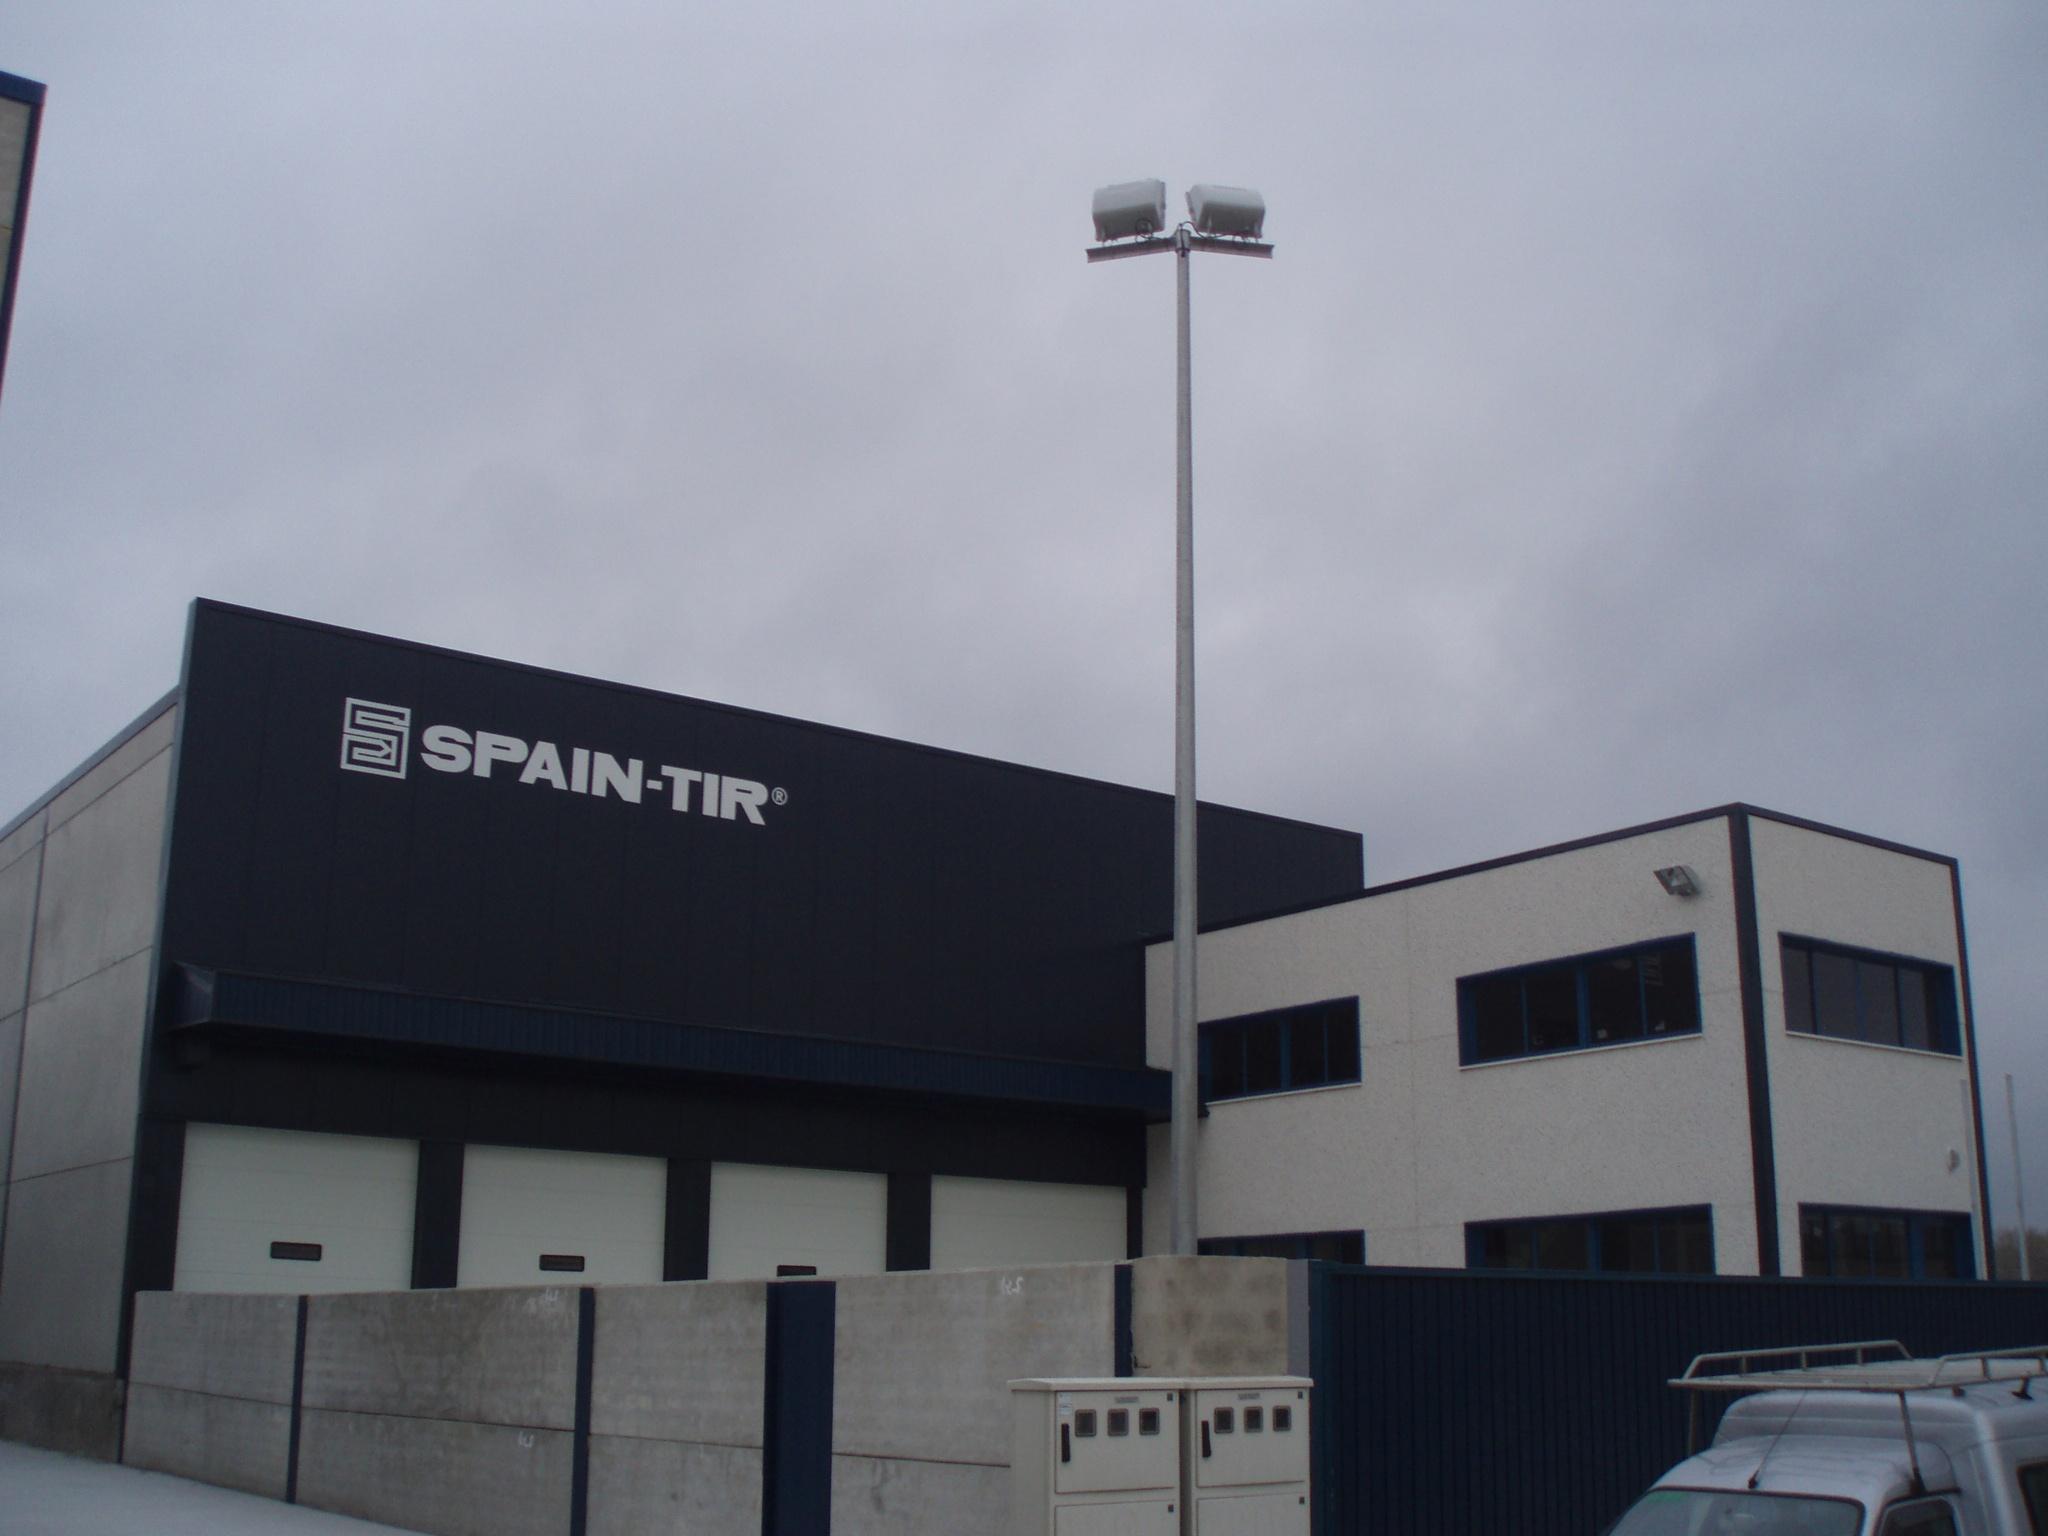 SPAIN-TIR